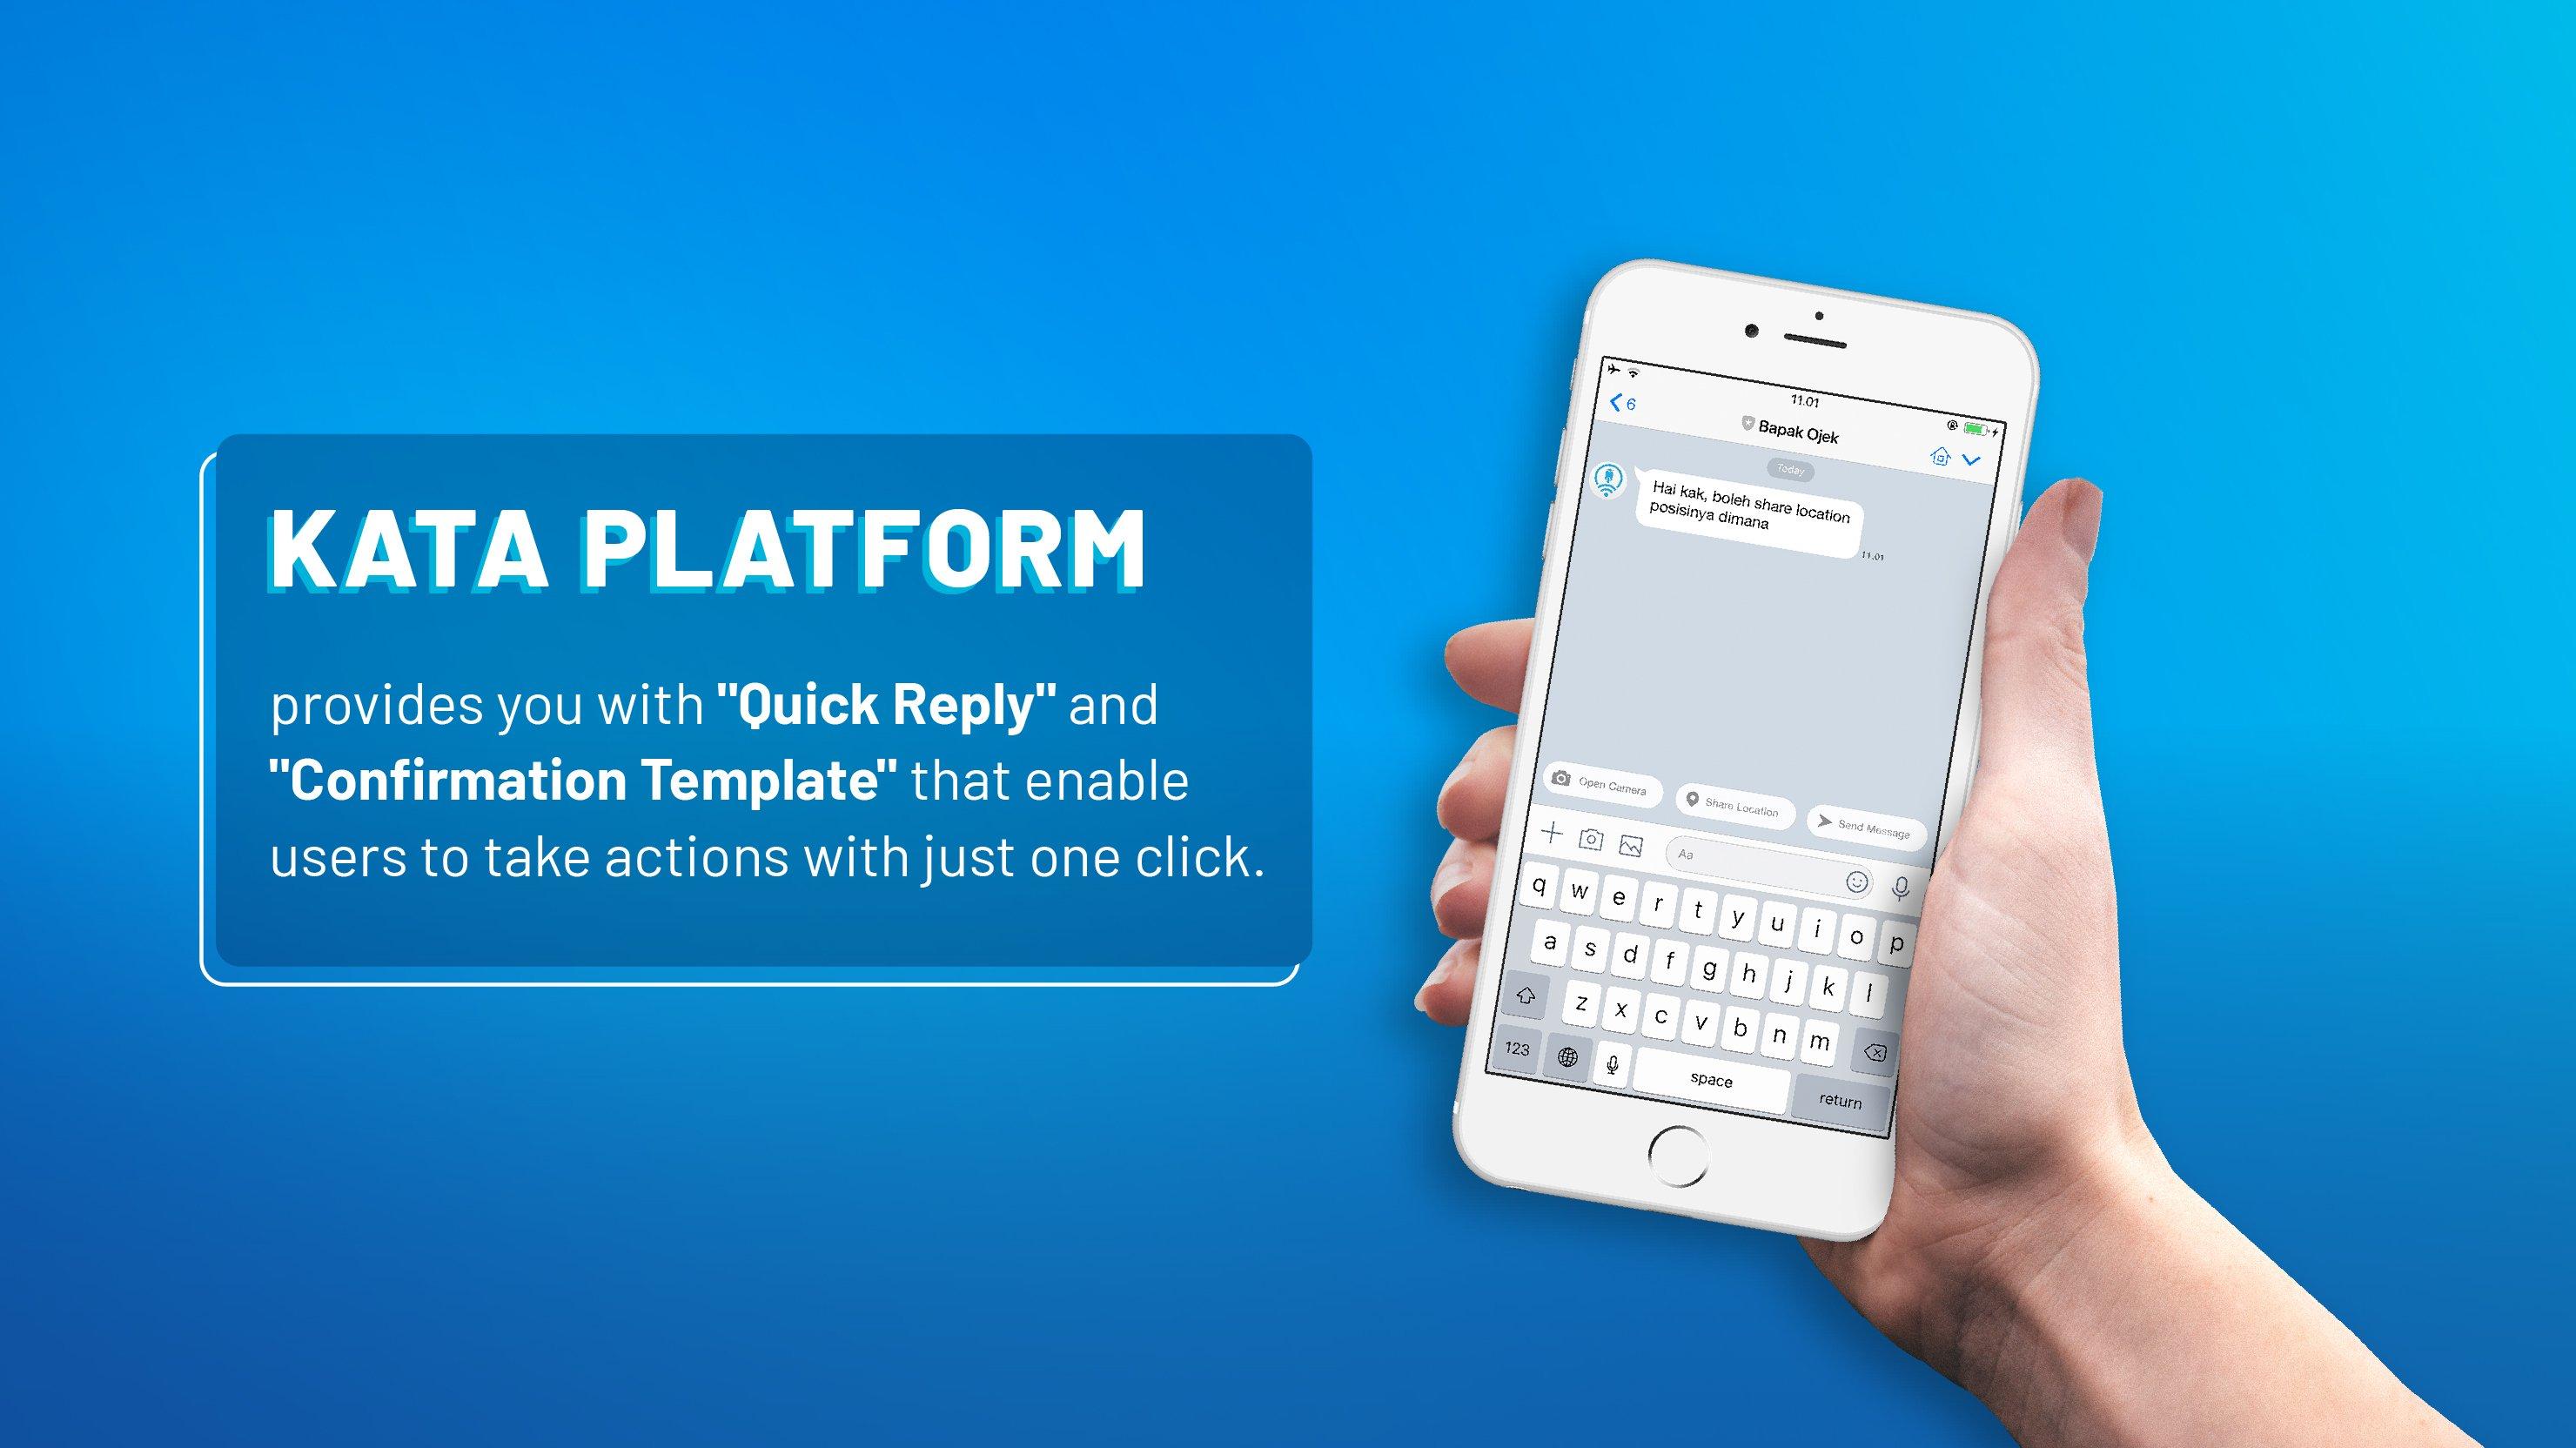 Kata Platform new features.